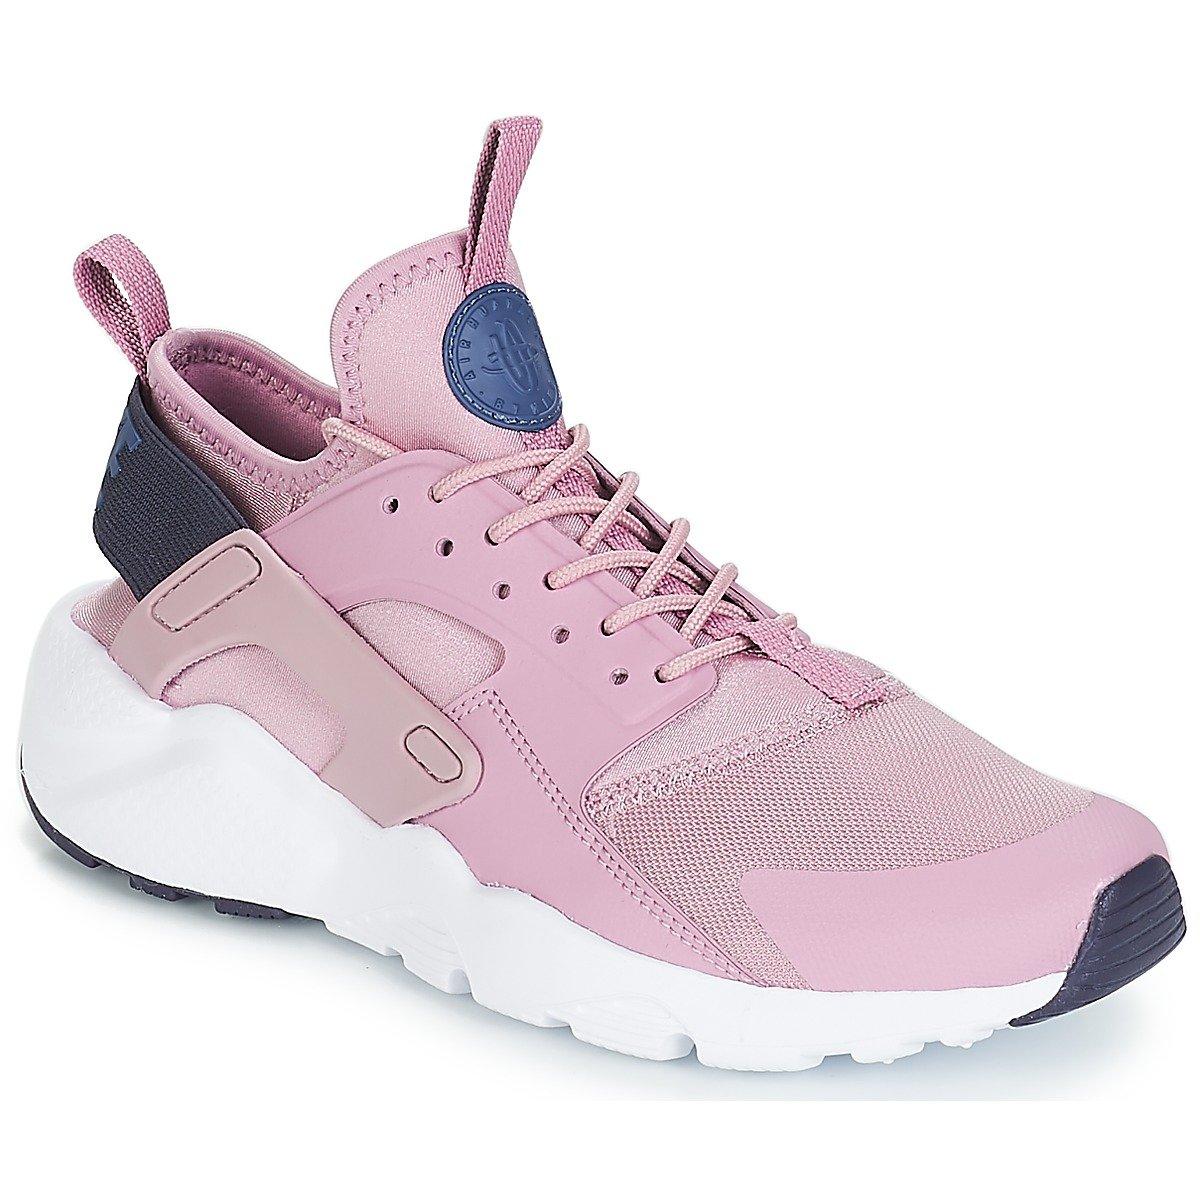 aeb6d598e745 Nike Women s Air Huarache Ultra Gs Competition Running Shoes ...